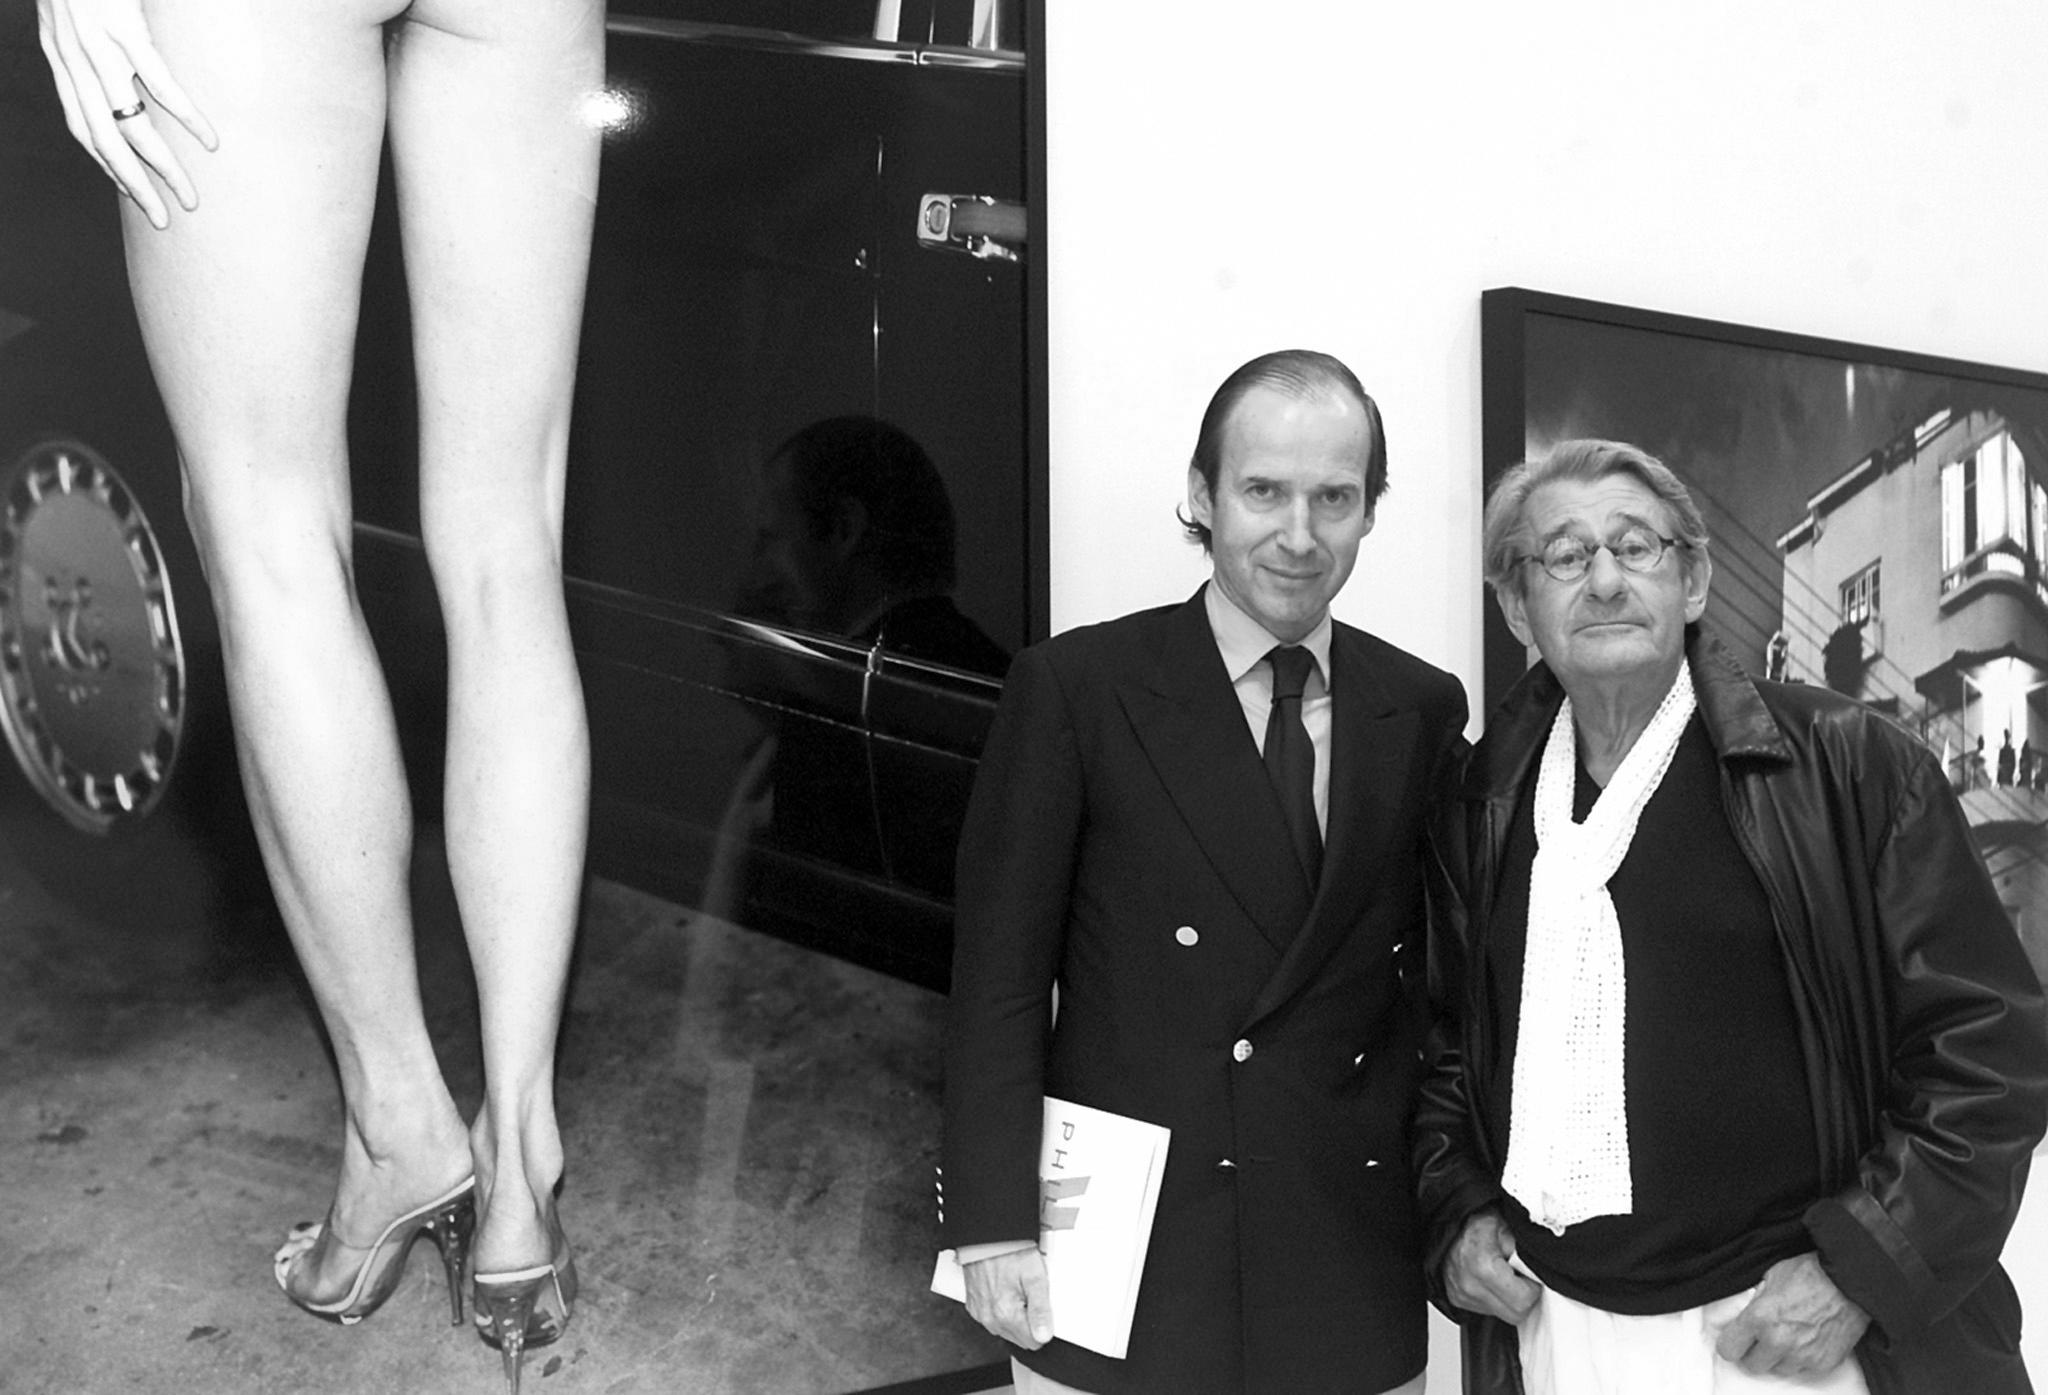 Helmut Newton - Starportrt, News, Bilder  Galade-9476